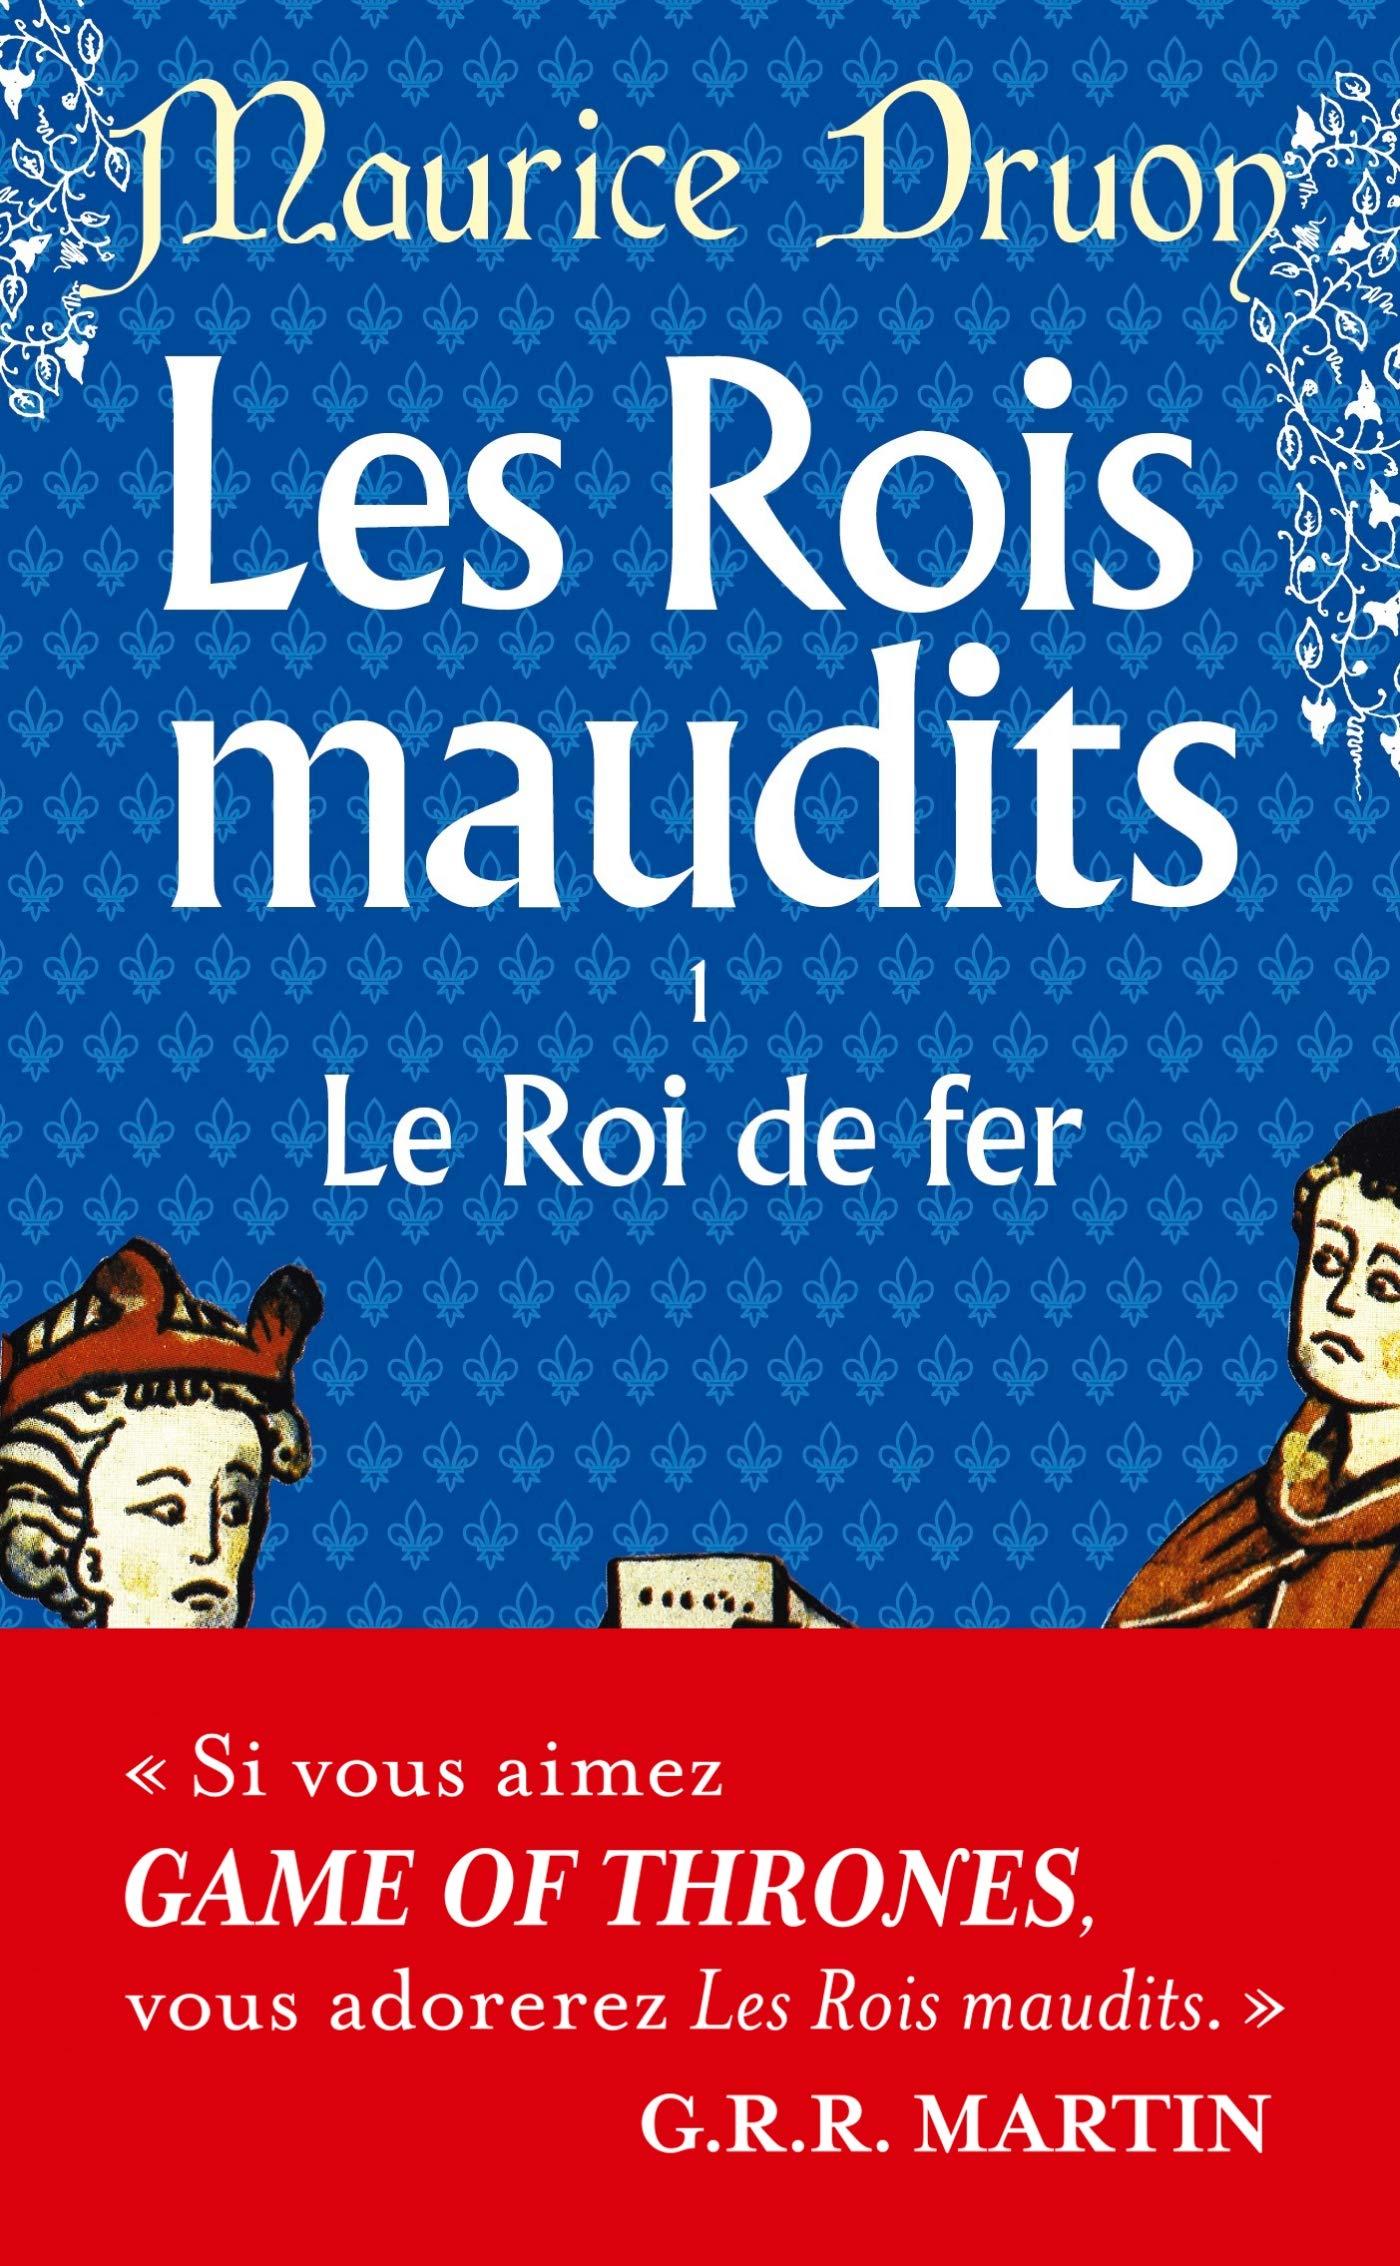 Le Roi de fer Les Rois maudits, Tome 1 Littérature: Amazon.es: Maurice Druon: Libros en idiomas extranjeros